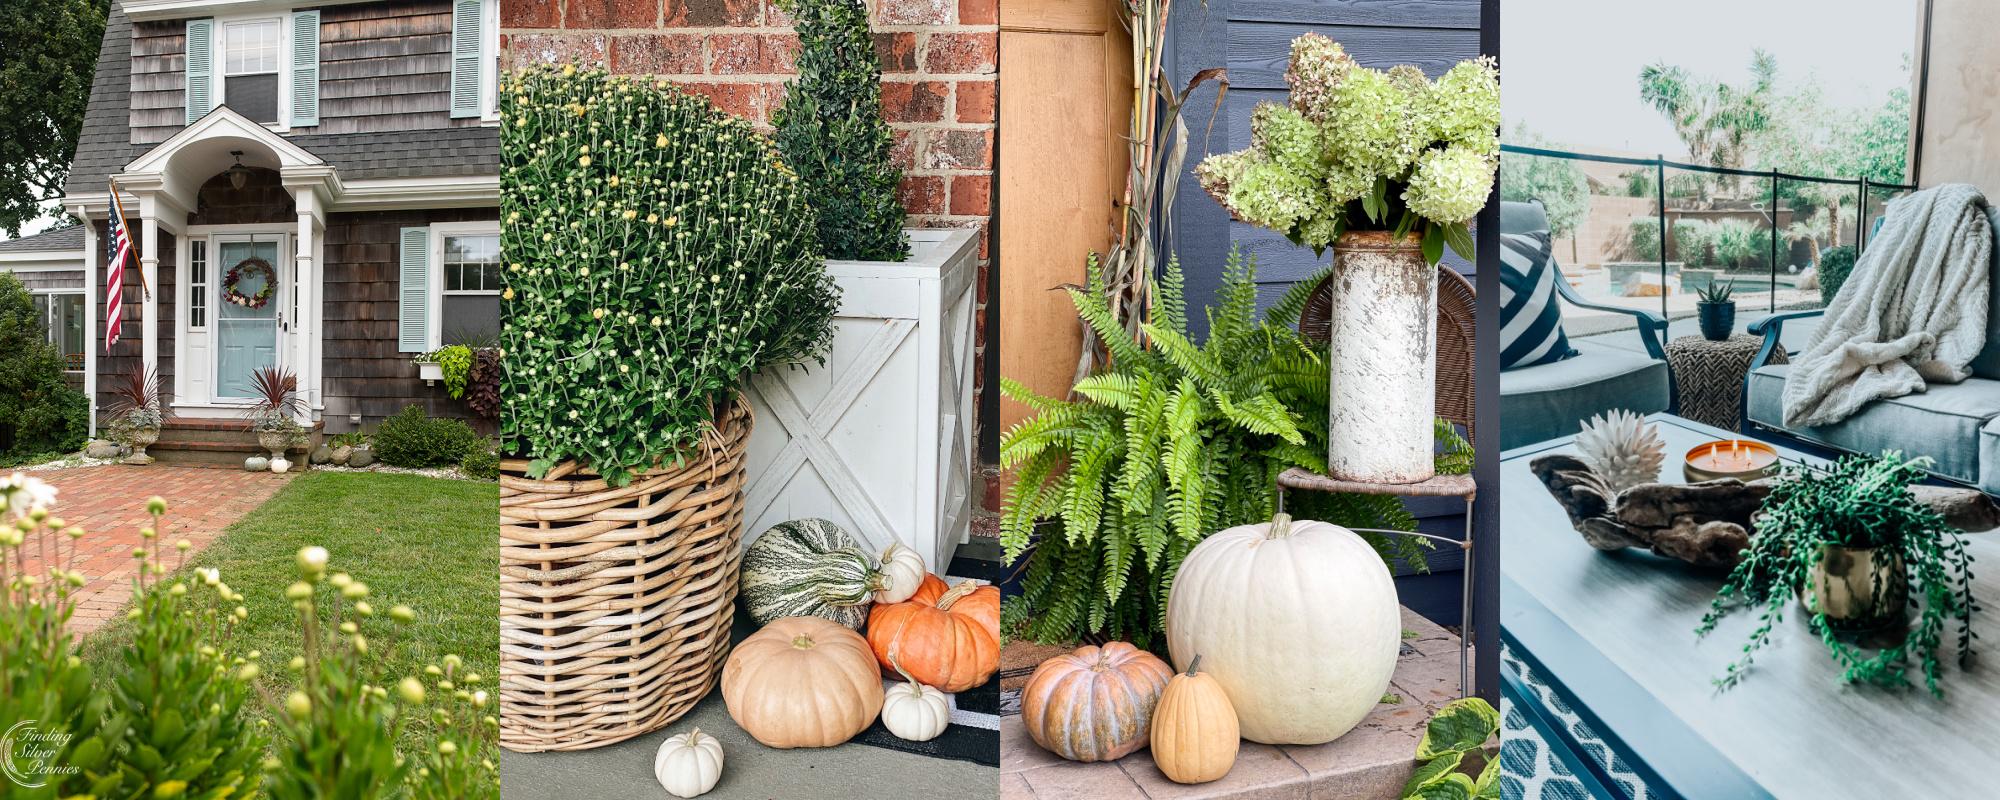 Autumn decorated outdoor spaces